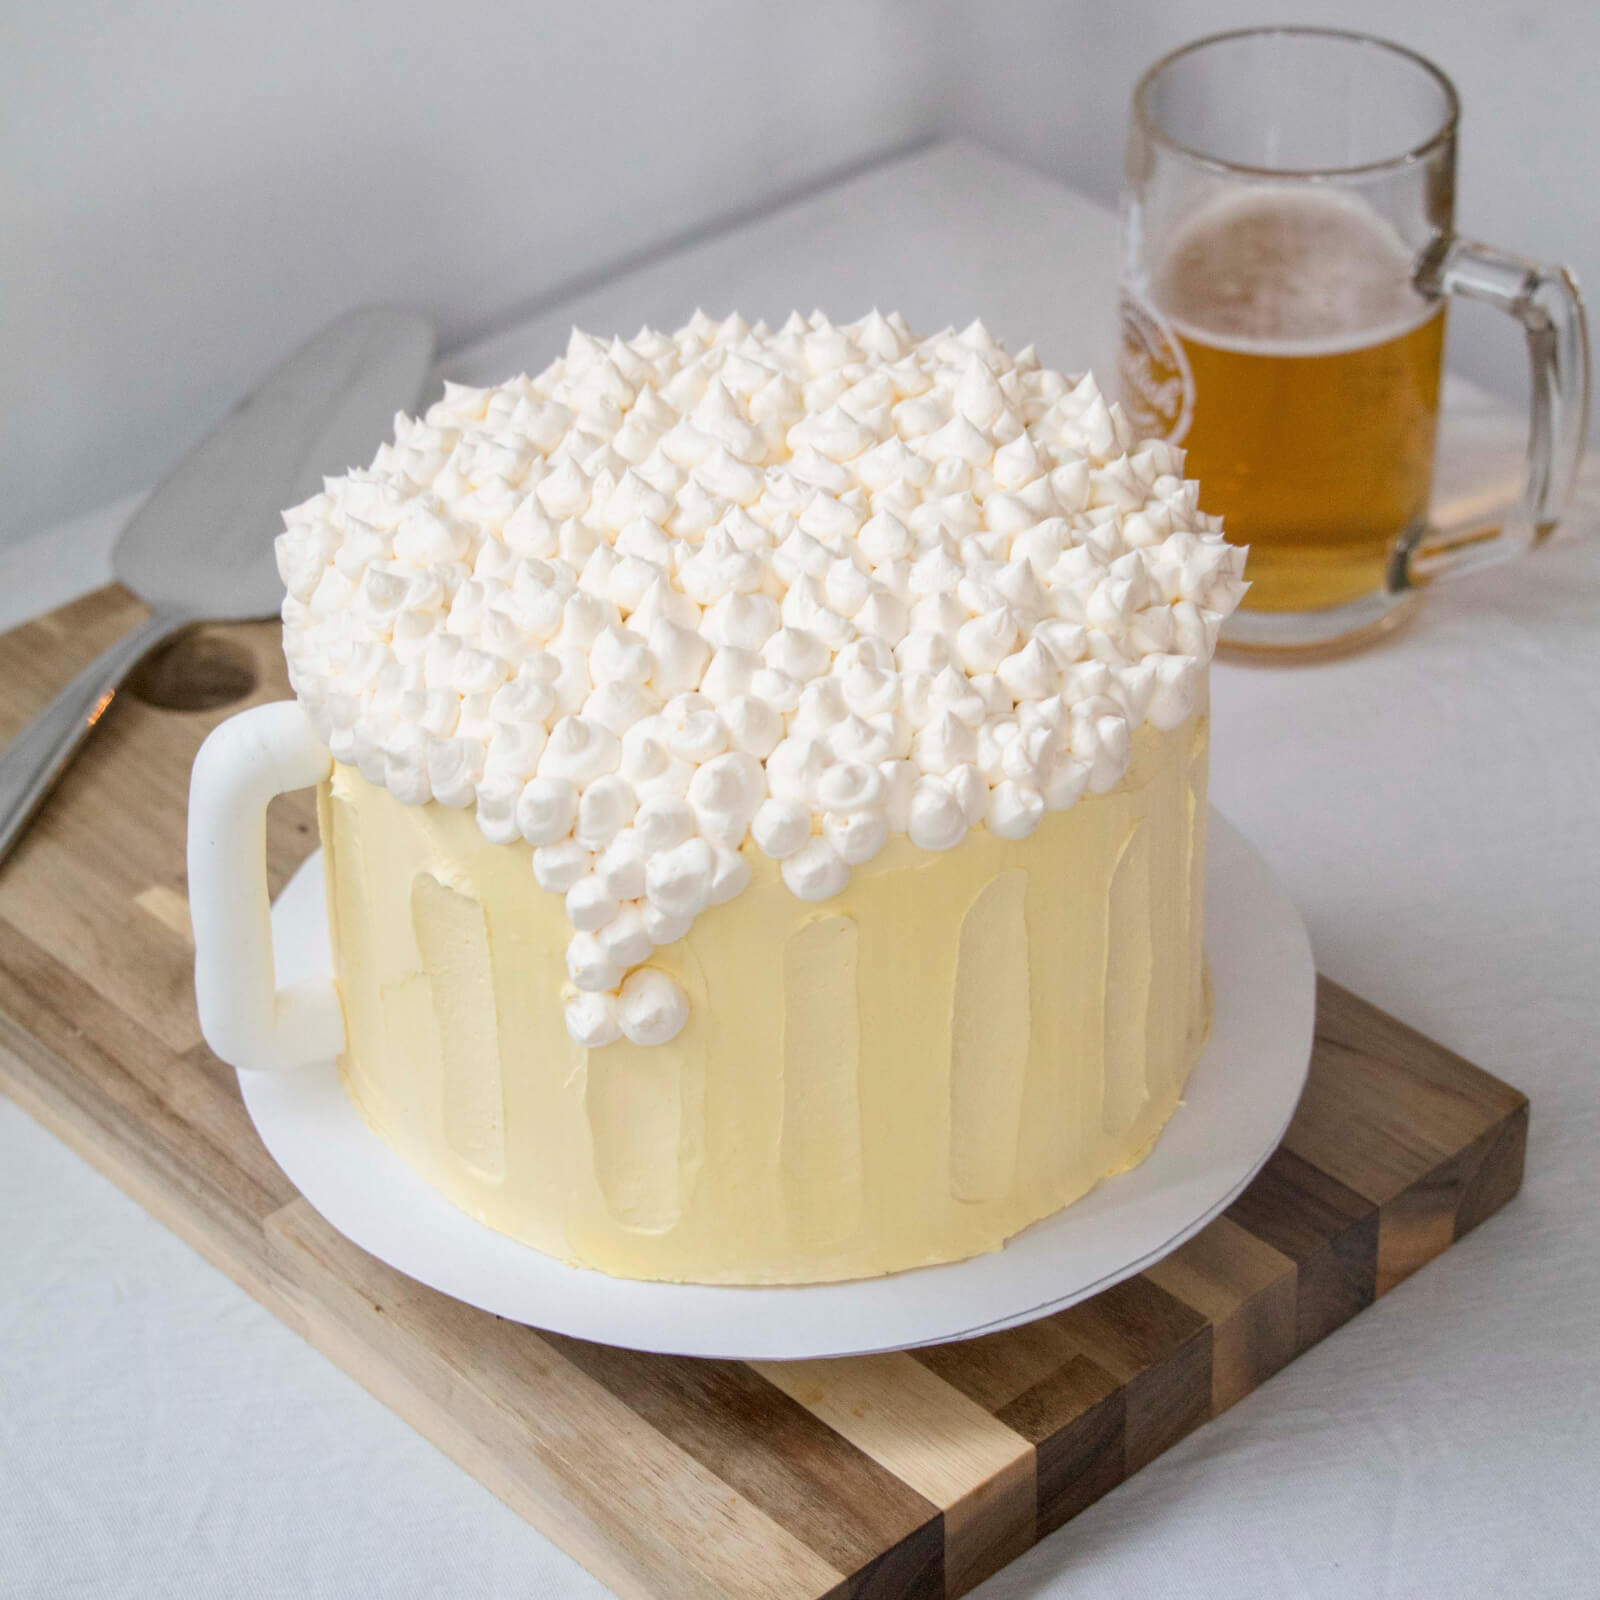 beer-mug-cake-recipe-biertorte-bierkuchen-bierkrugtorte-maß-biertorte-square